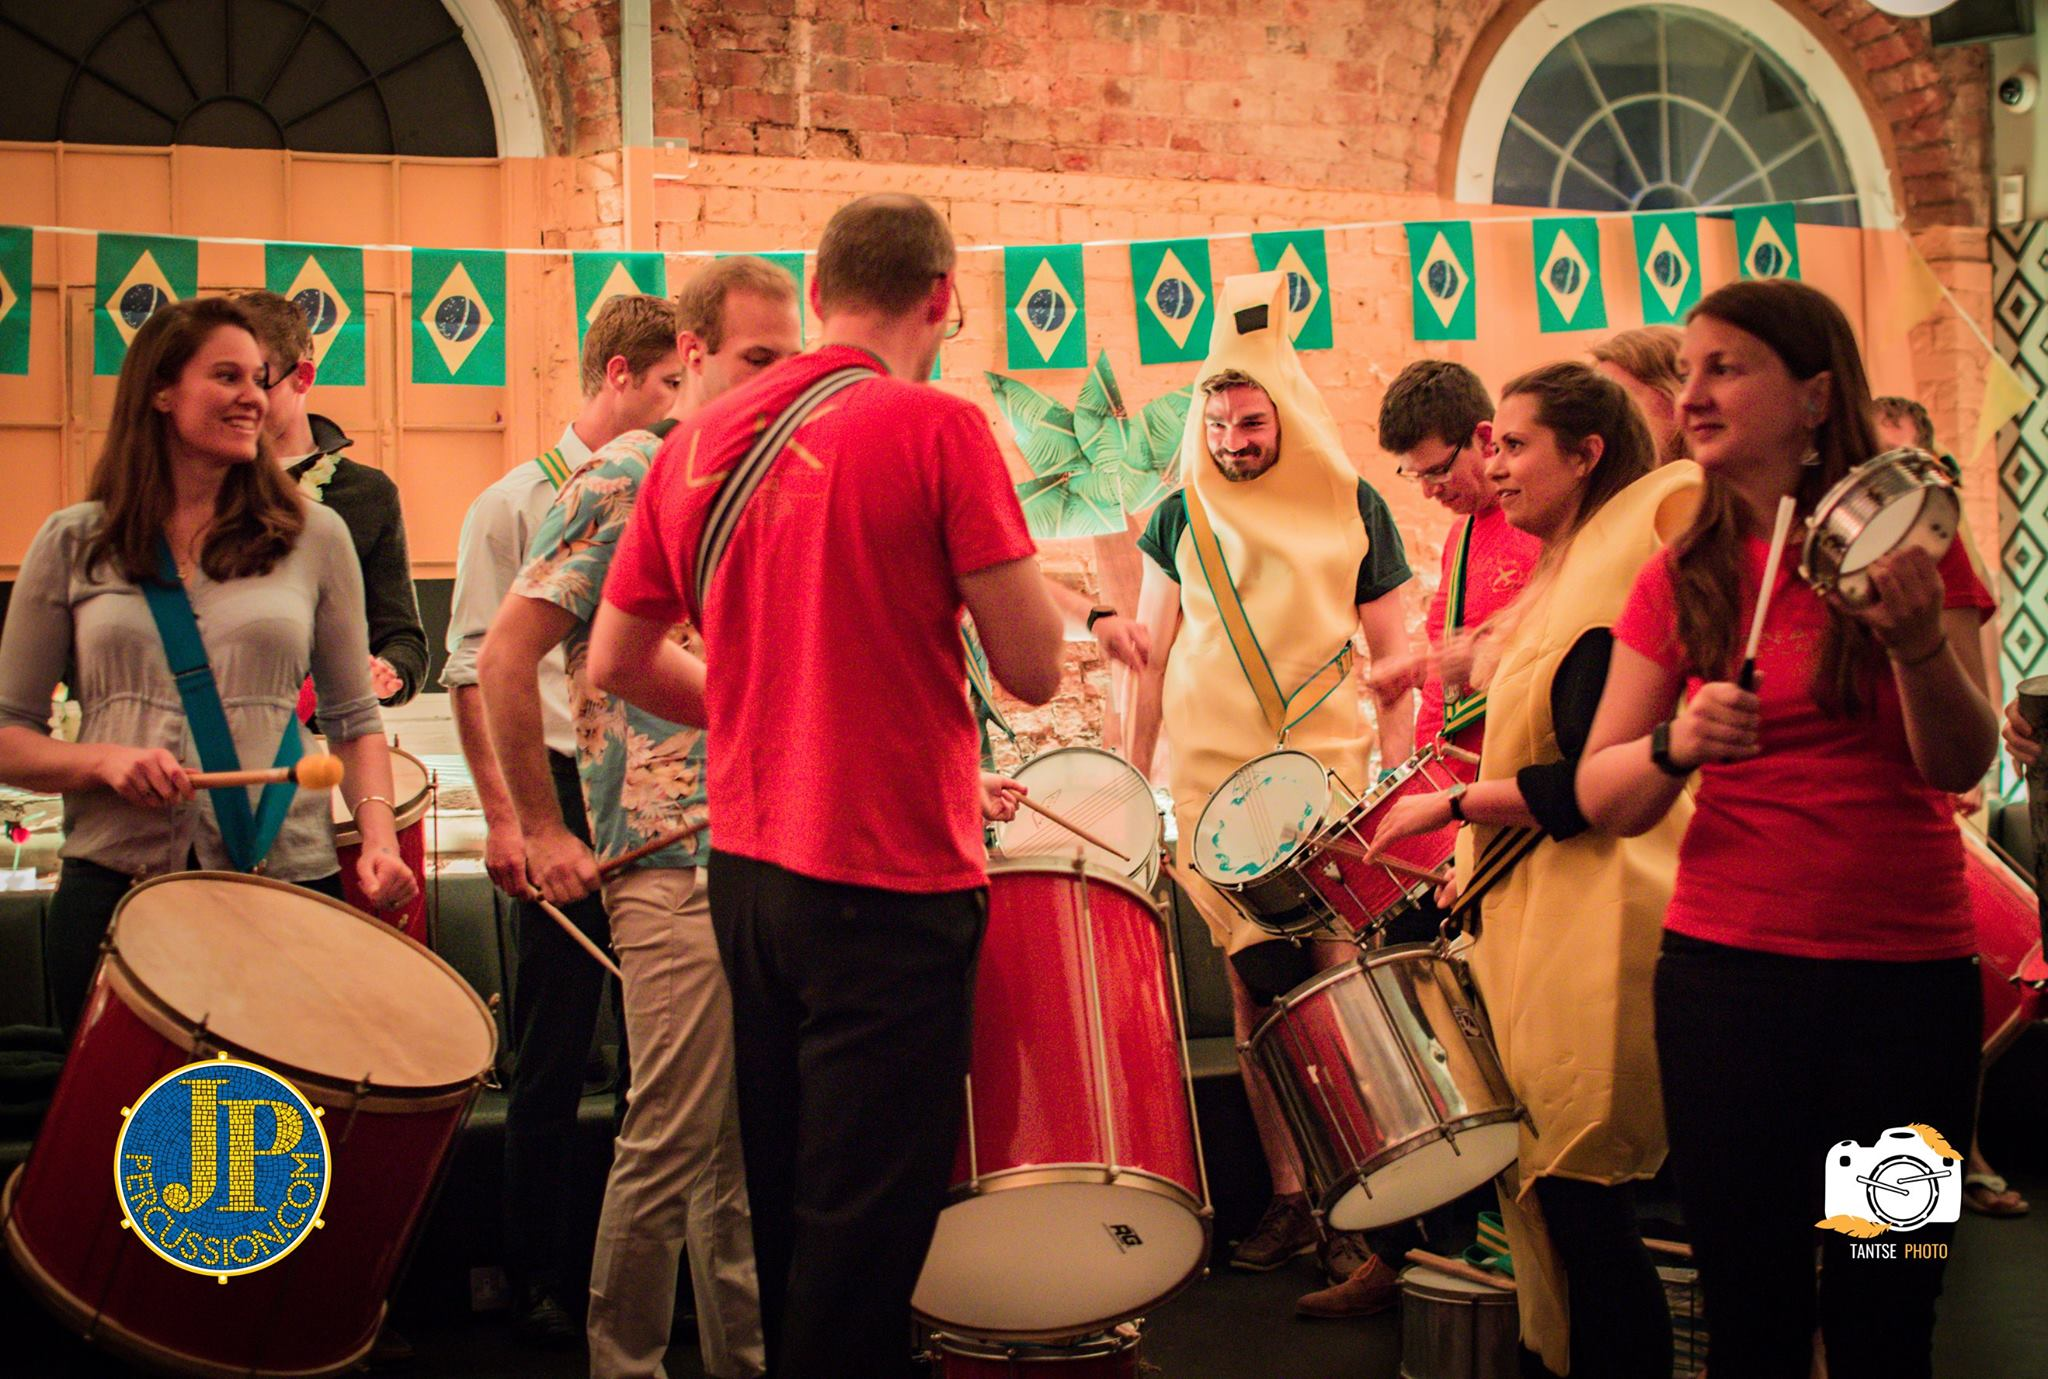 Drummers getting groovy